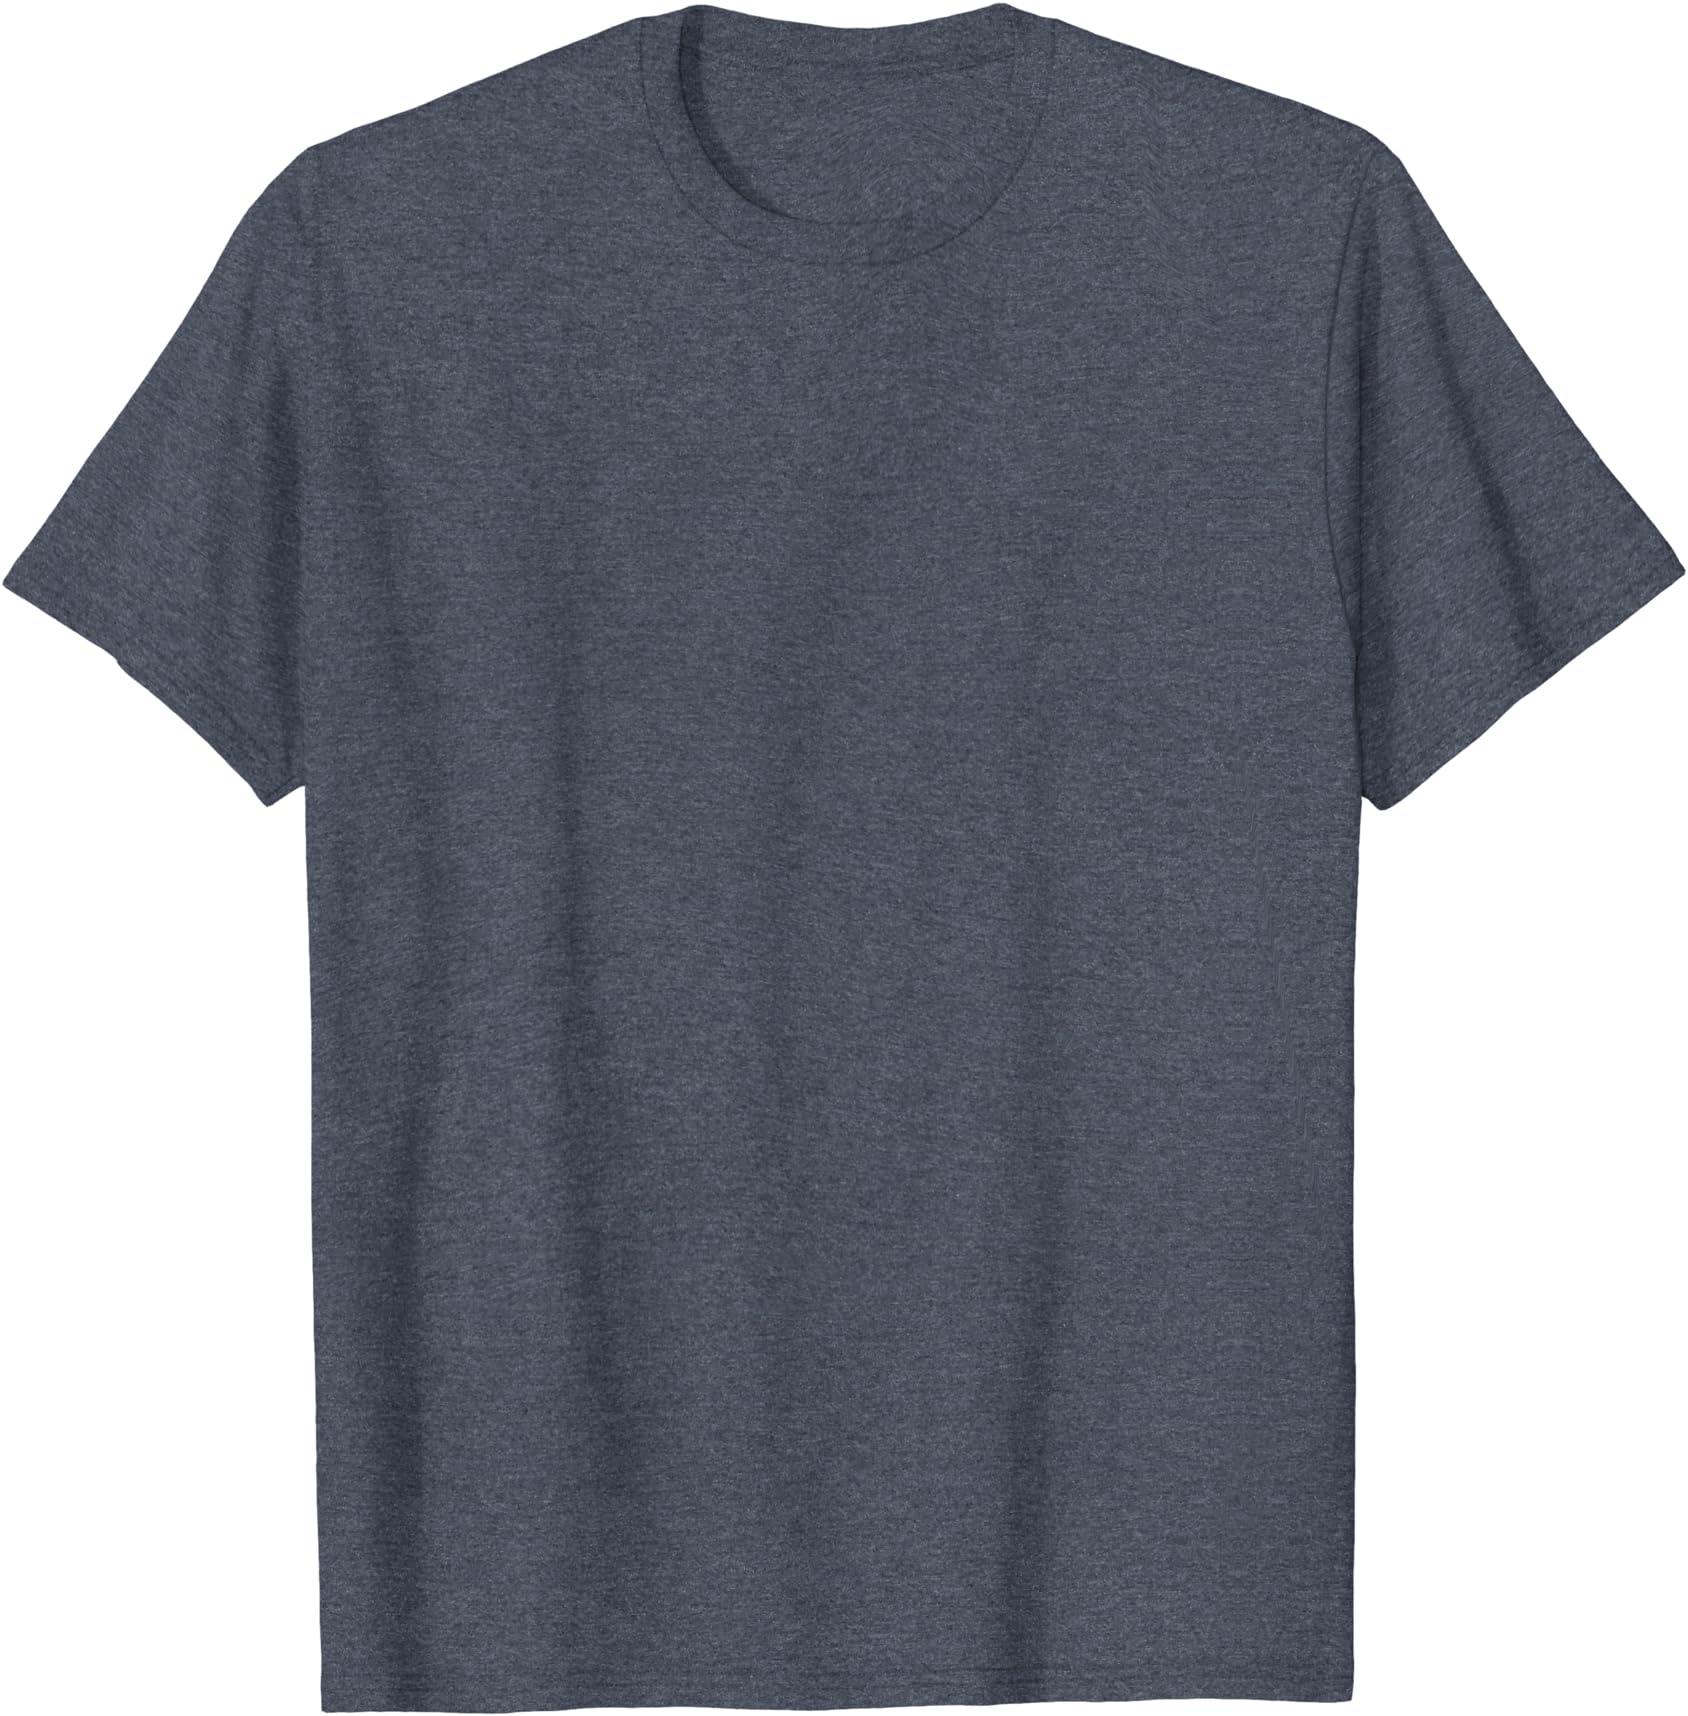 BUSHCRAFT DESIGN CASUAL BLACK CREW NECK T-SHIRT CAMPING BUSHCRAFT CLOTHING